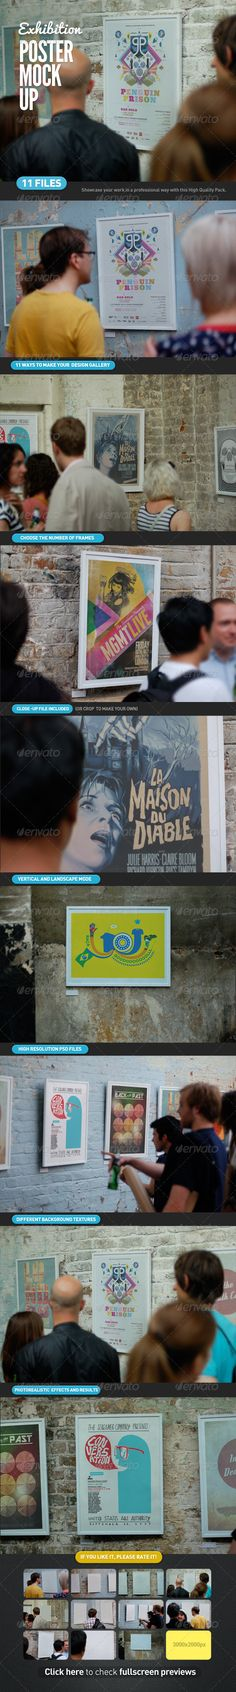 Poster Exhibition Gallery Mock-Up Download here: https://graphicriver.net/item/poster-exhibition-gallery-mockup/3399079?ref=KlitVogli